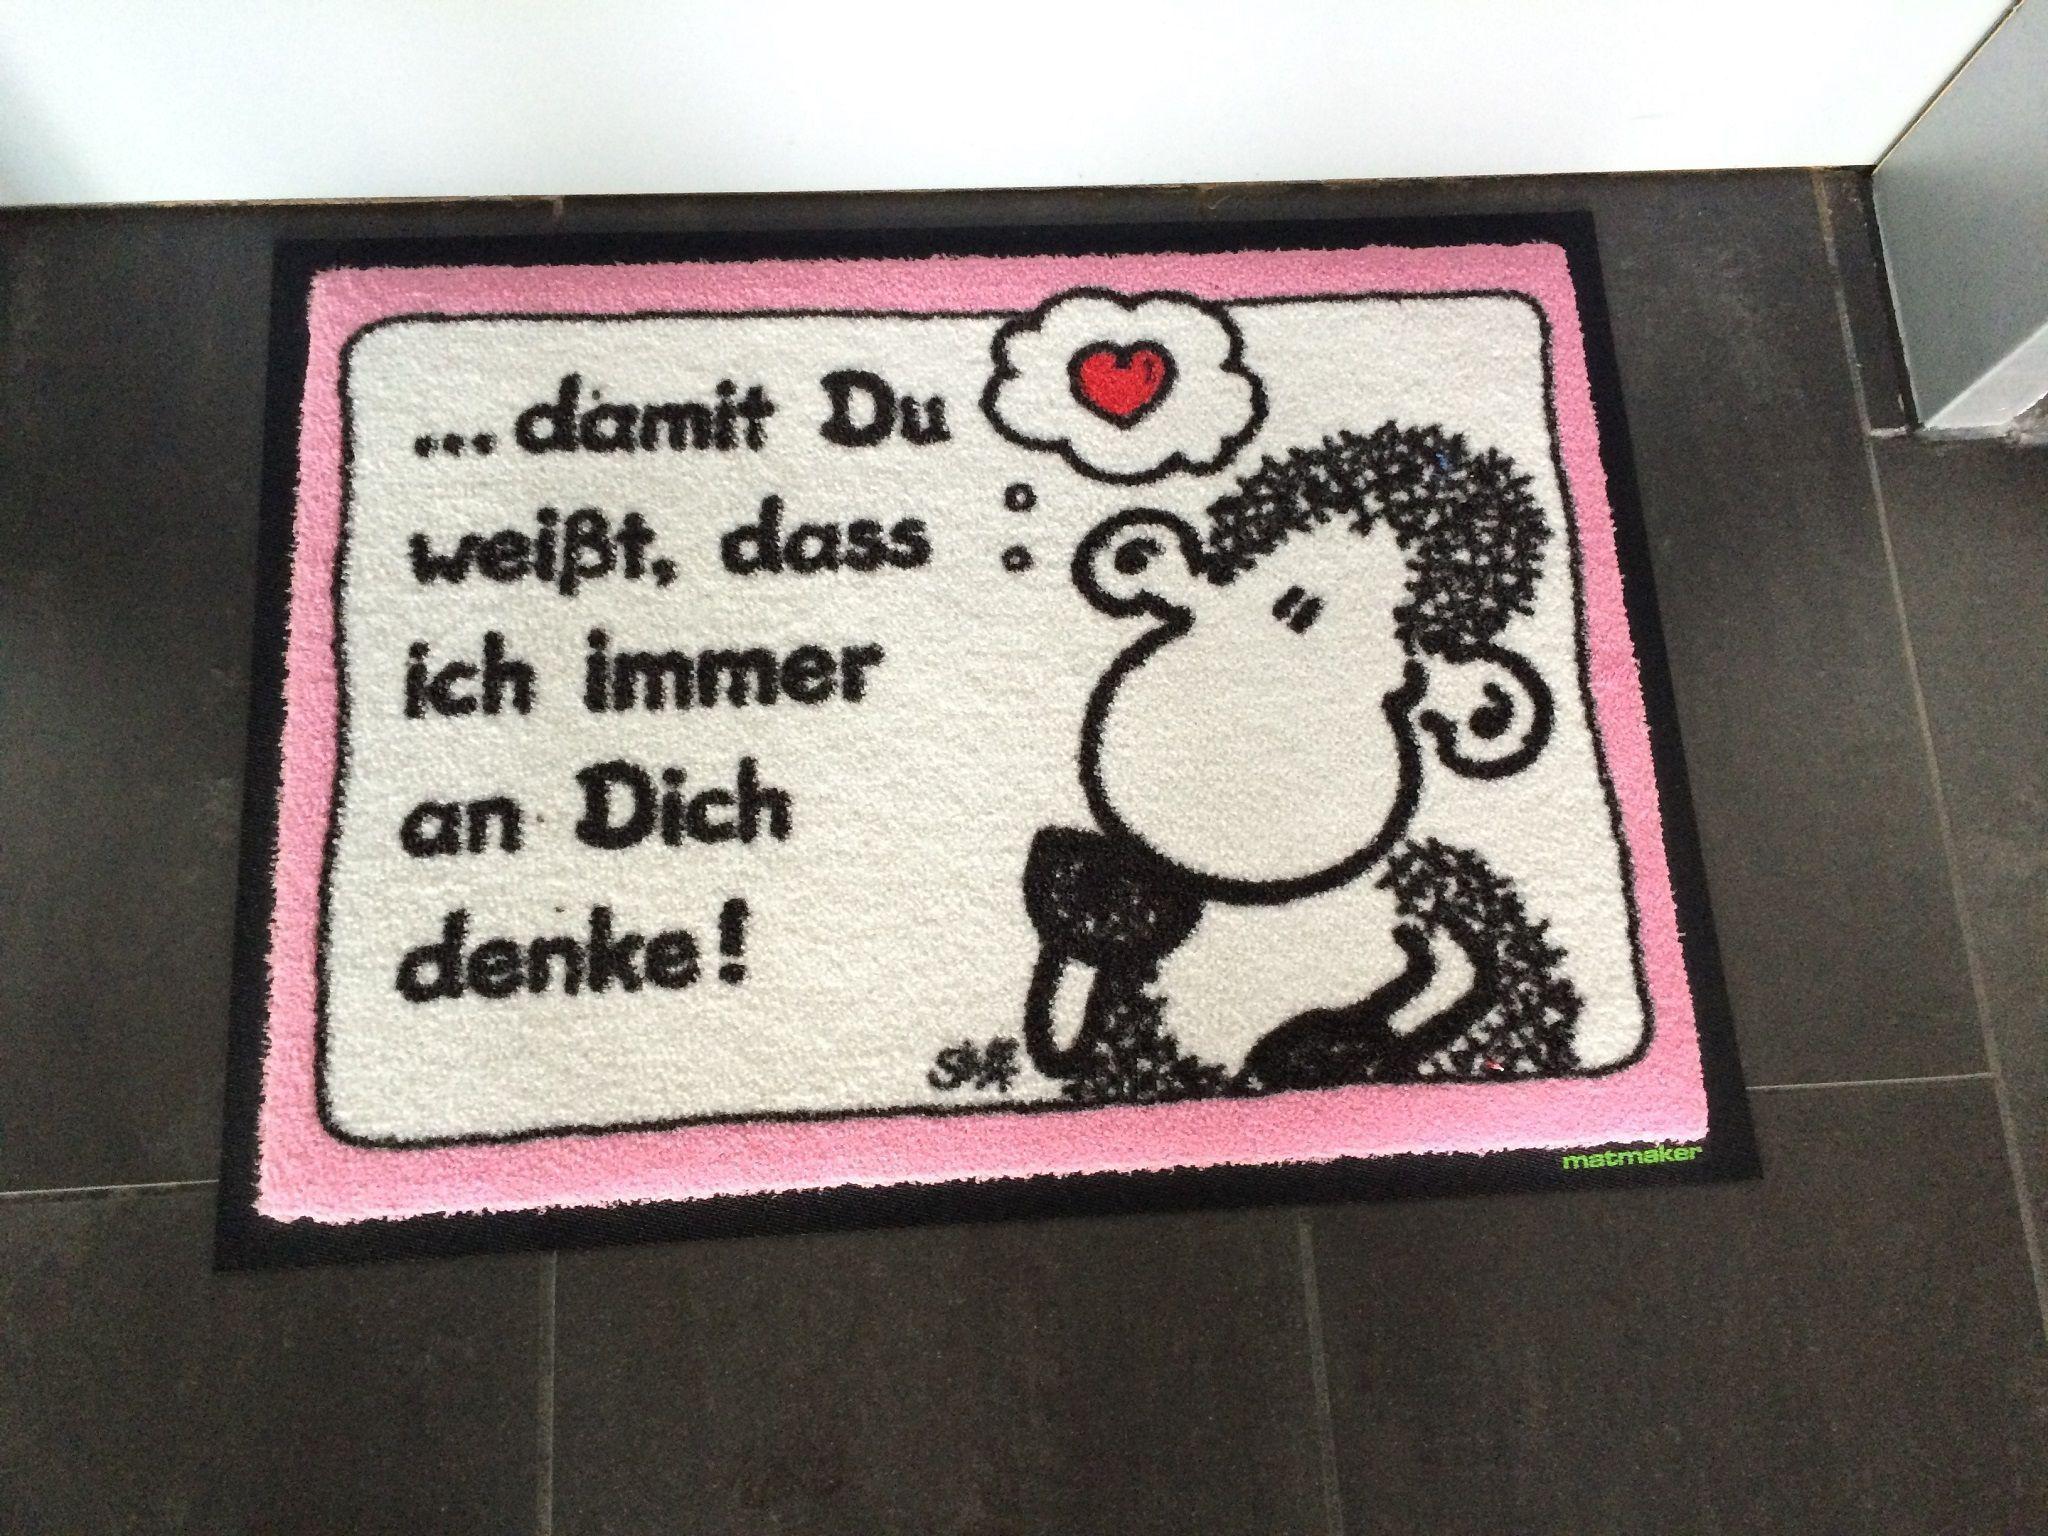 jemand denkt an Dich! Fußmatten mit Sheepworld-Motiven